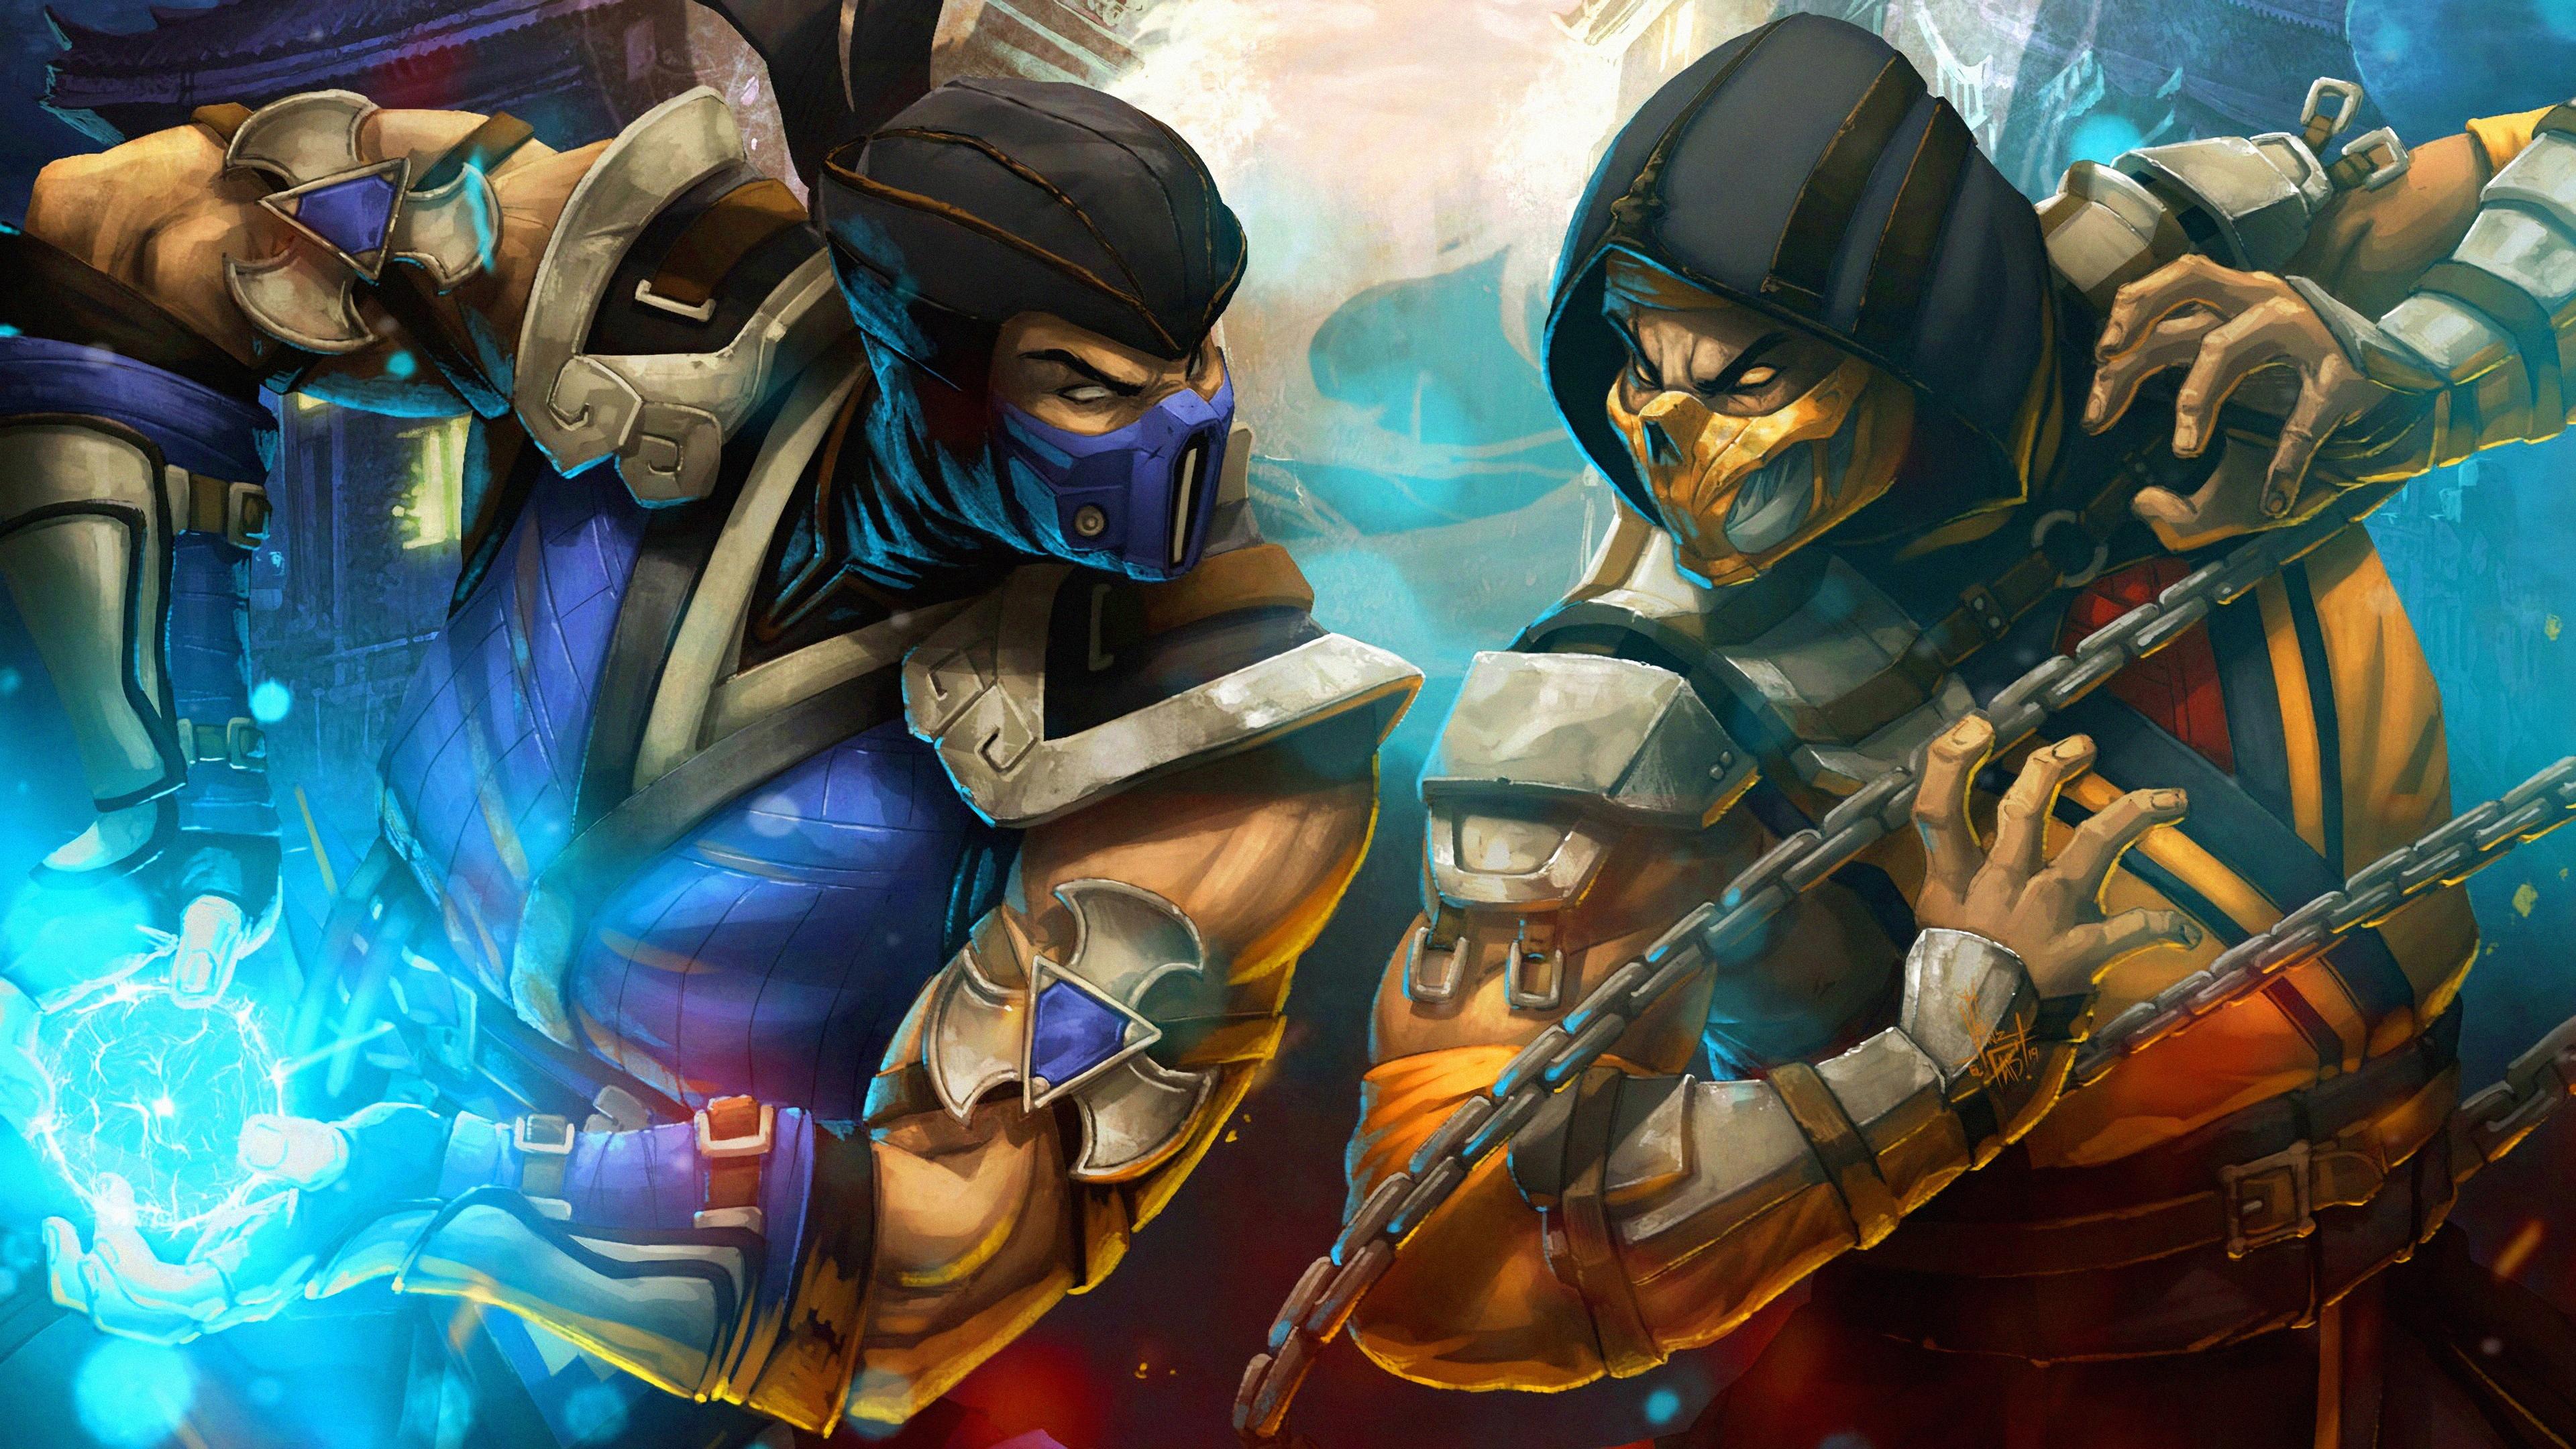 3840x2160 4k Mortal Kombat 4k Hd 4k Wallpapers Images